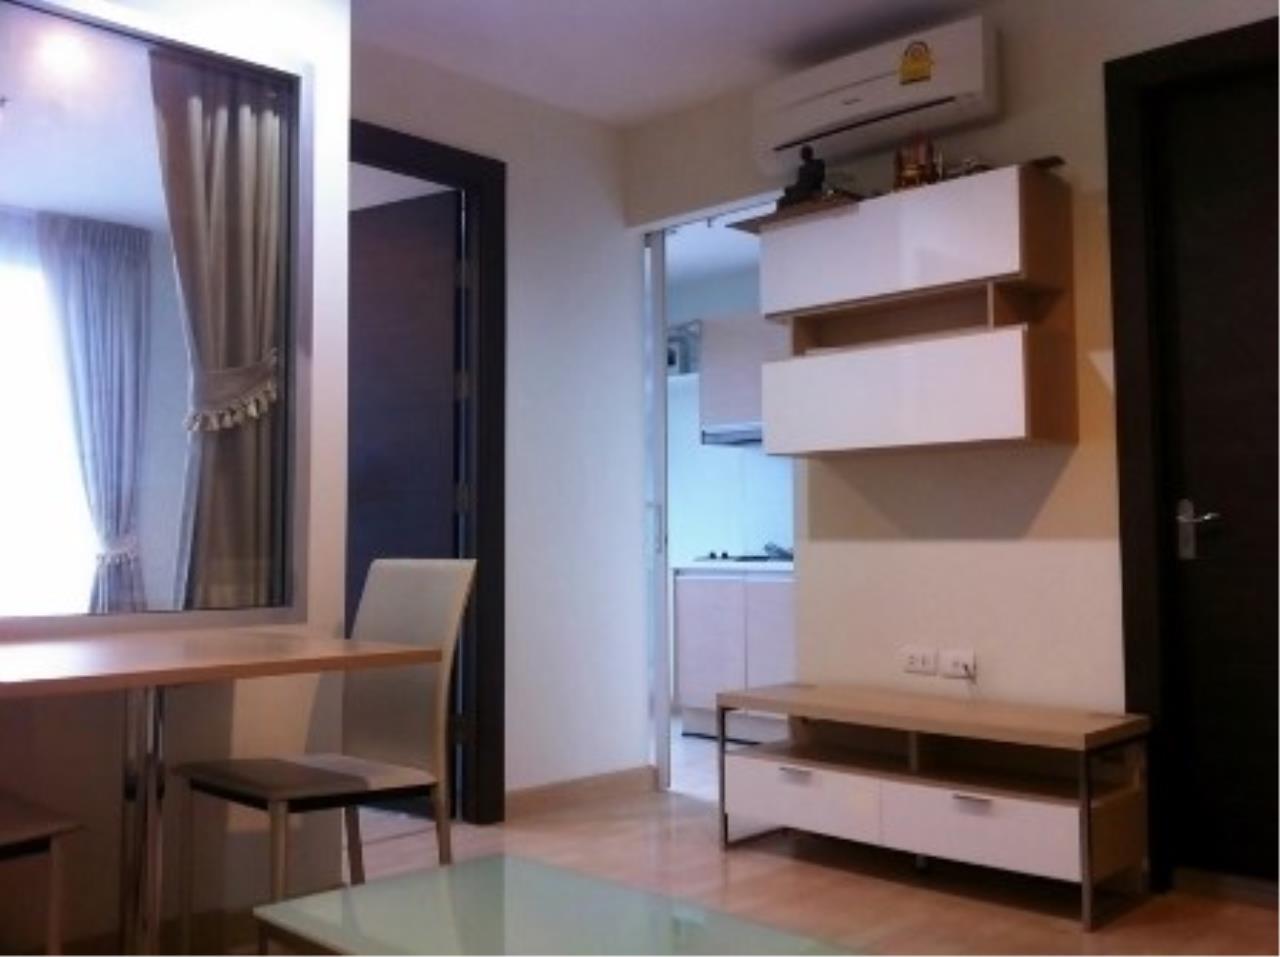 Agent - Prombood Agency's Sale - 1 Bedroom 36 sq.m. Rhythm Ratchada near Ratchadapisek MRT Station 3